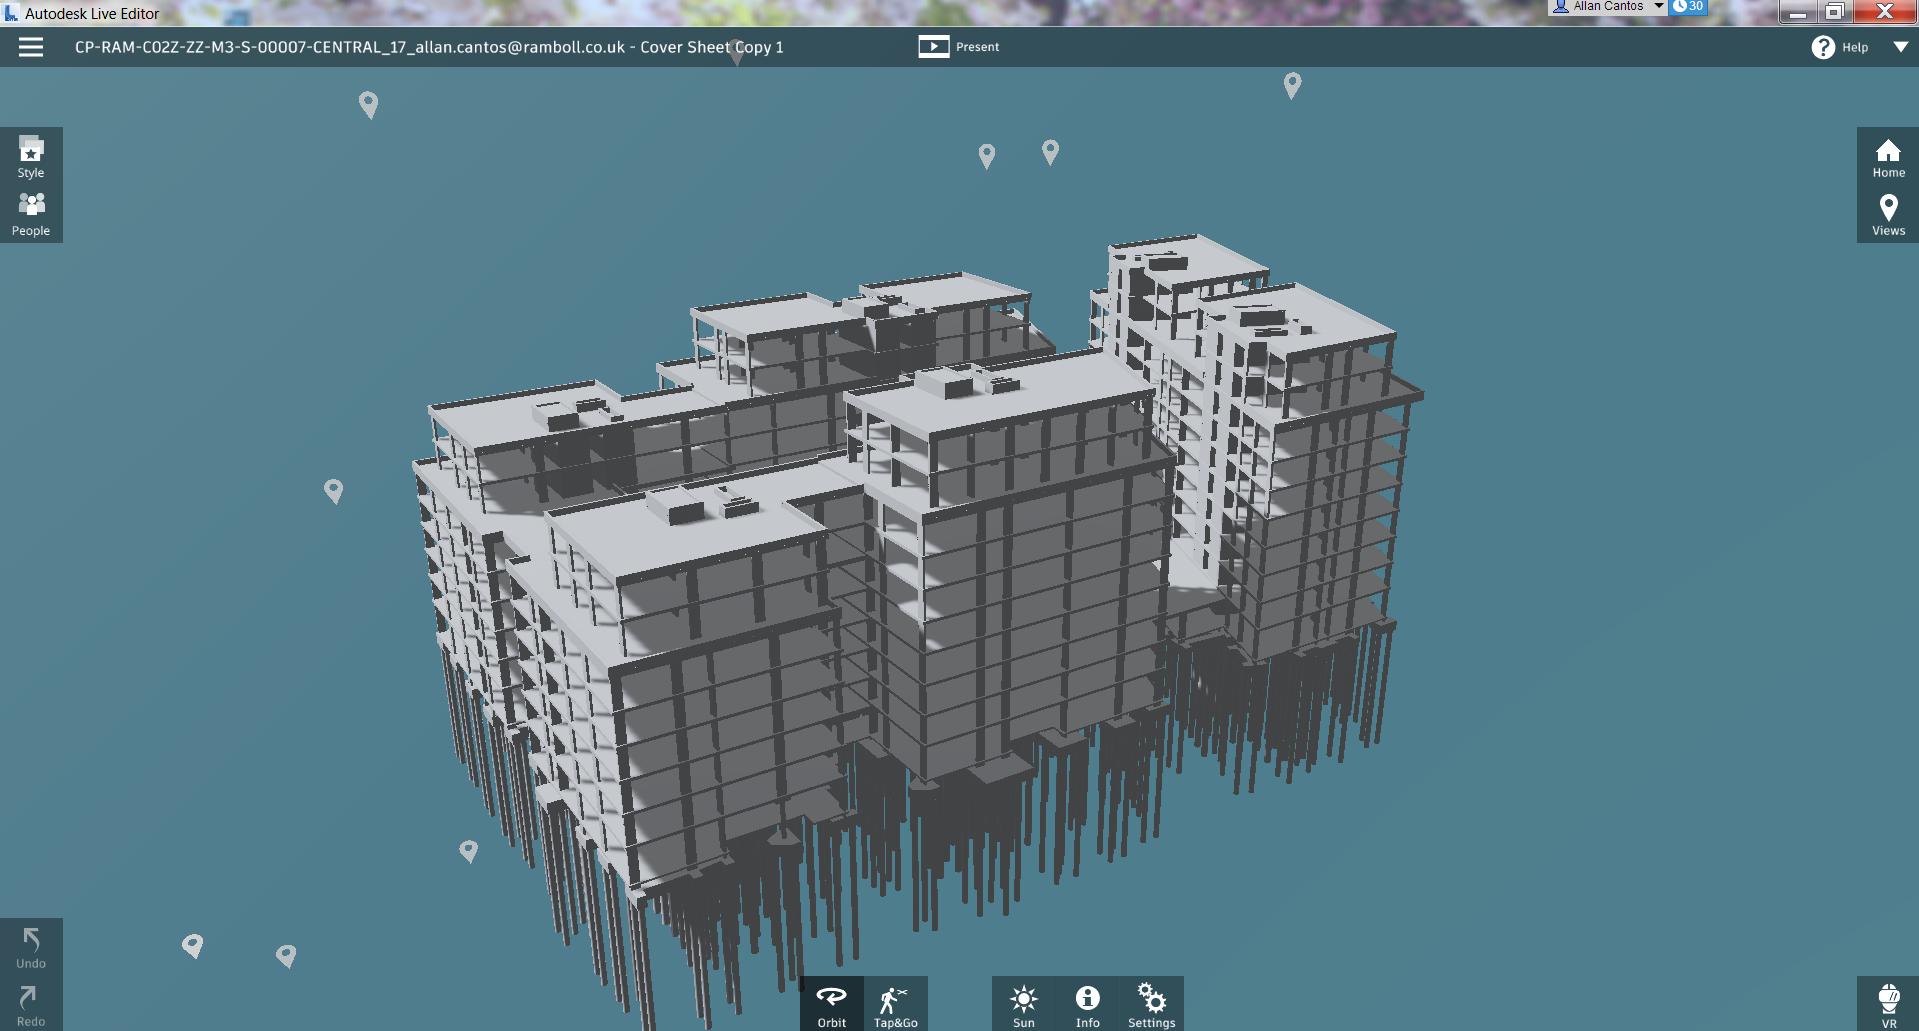 My Autodesk Revit Live Experience